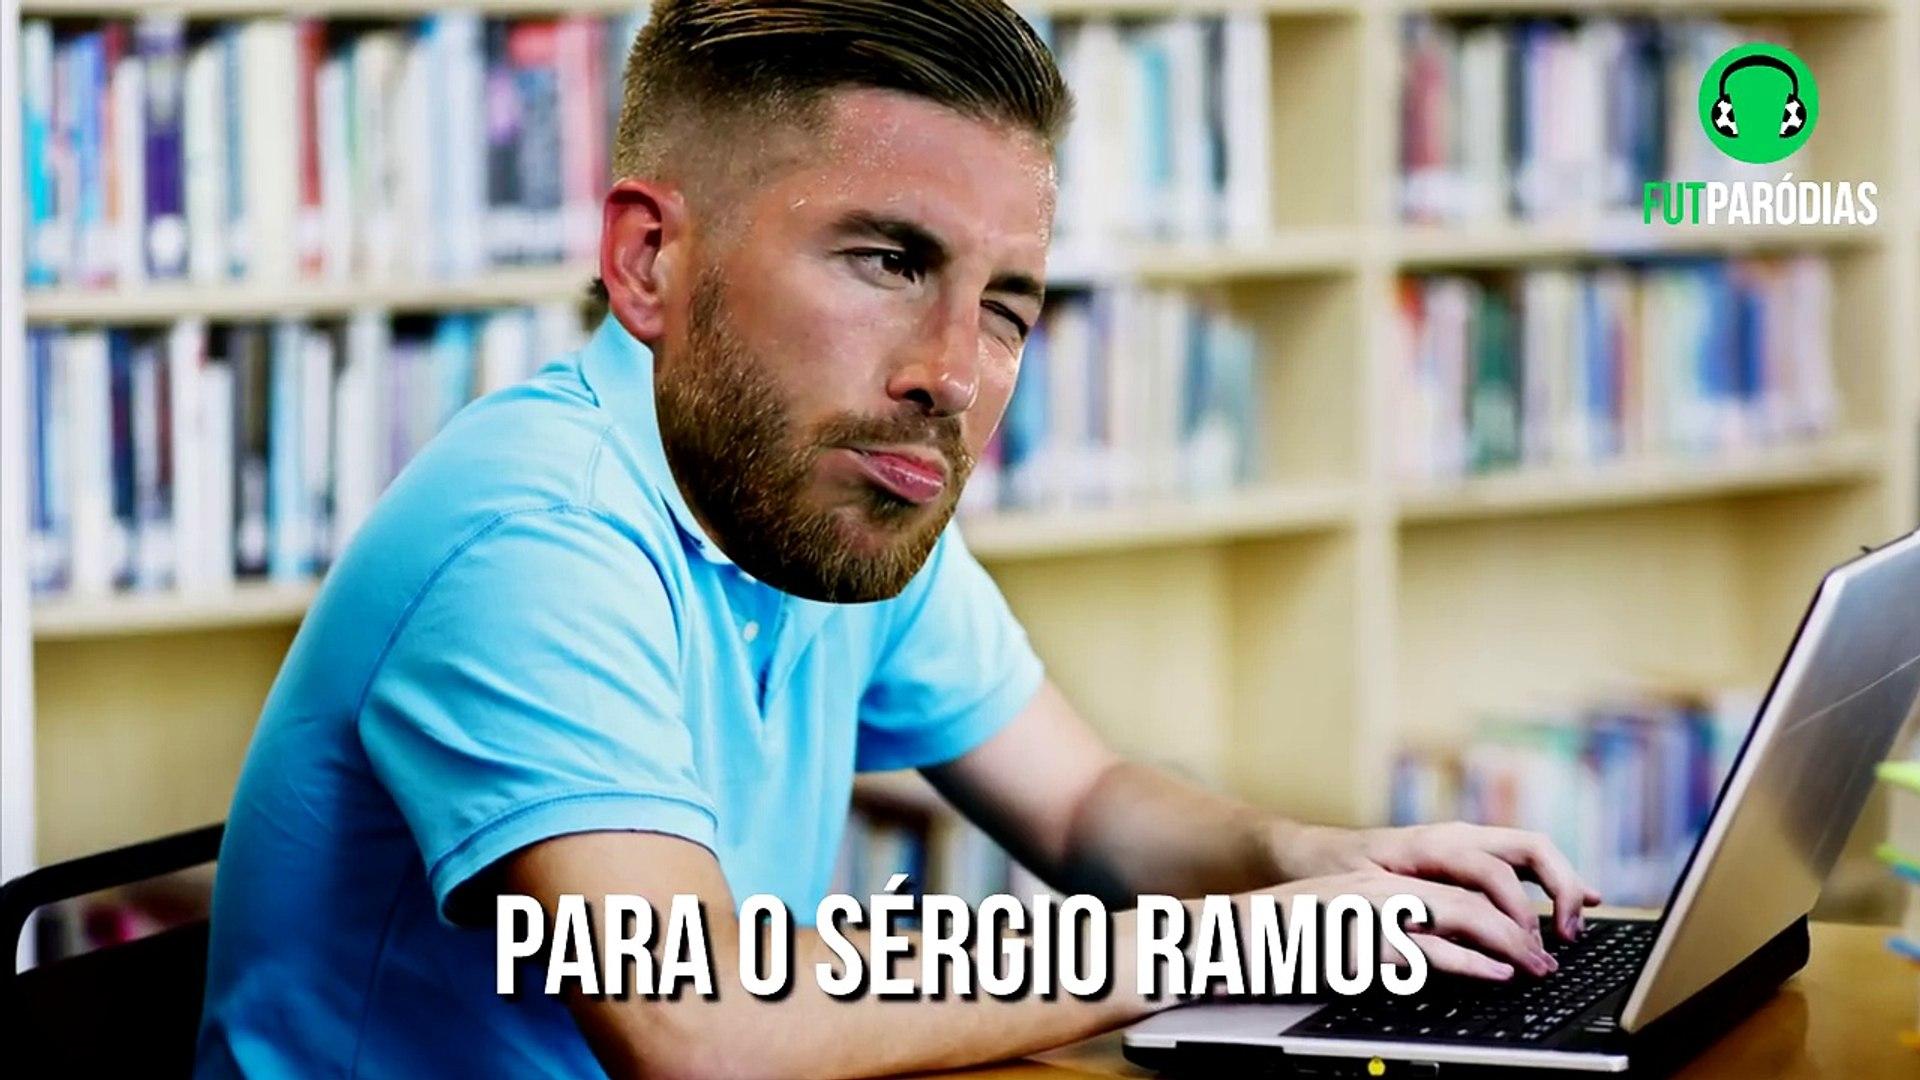 ♫ REAL MADRID CAMPEÃO DA CHAMPIONS | Paródia Suíte 14 - Henrique & Diego ft. Mc Guimê